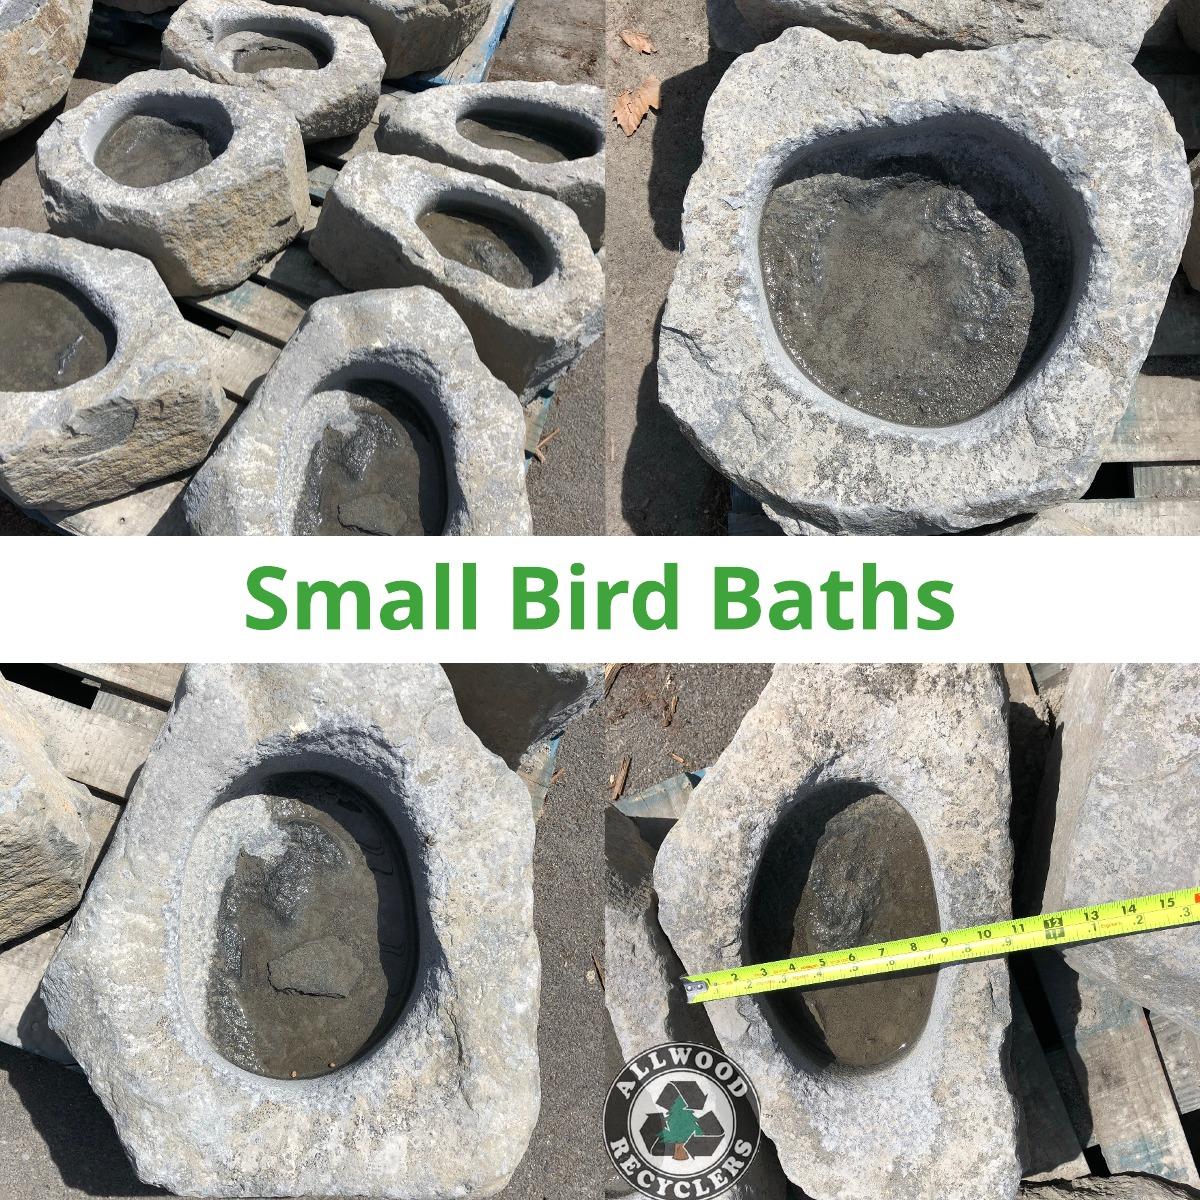 Small Bird Baths